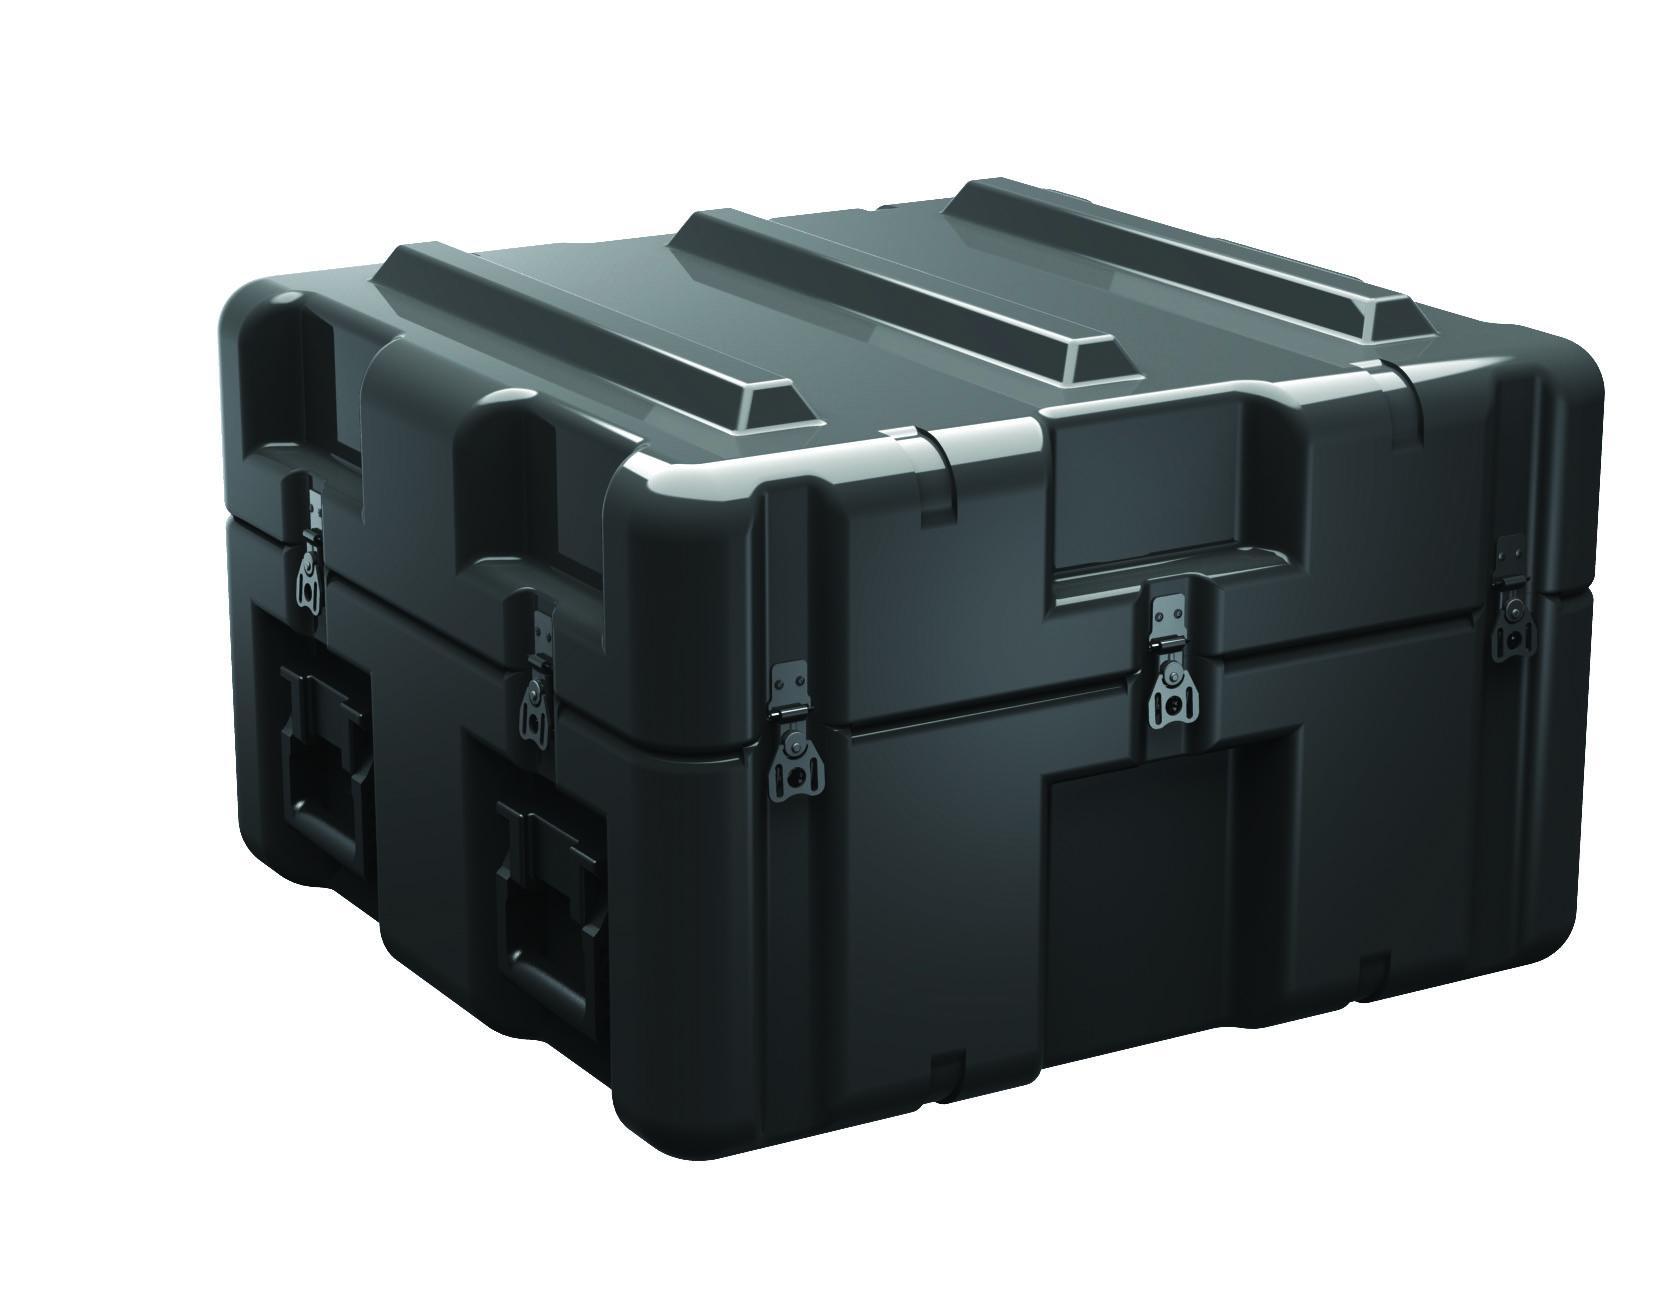 AL2423-0906 - AL2423-0906 Hinged Single Lid Case - CasesTsa